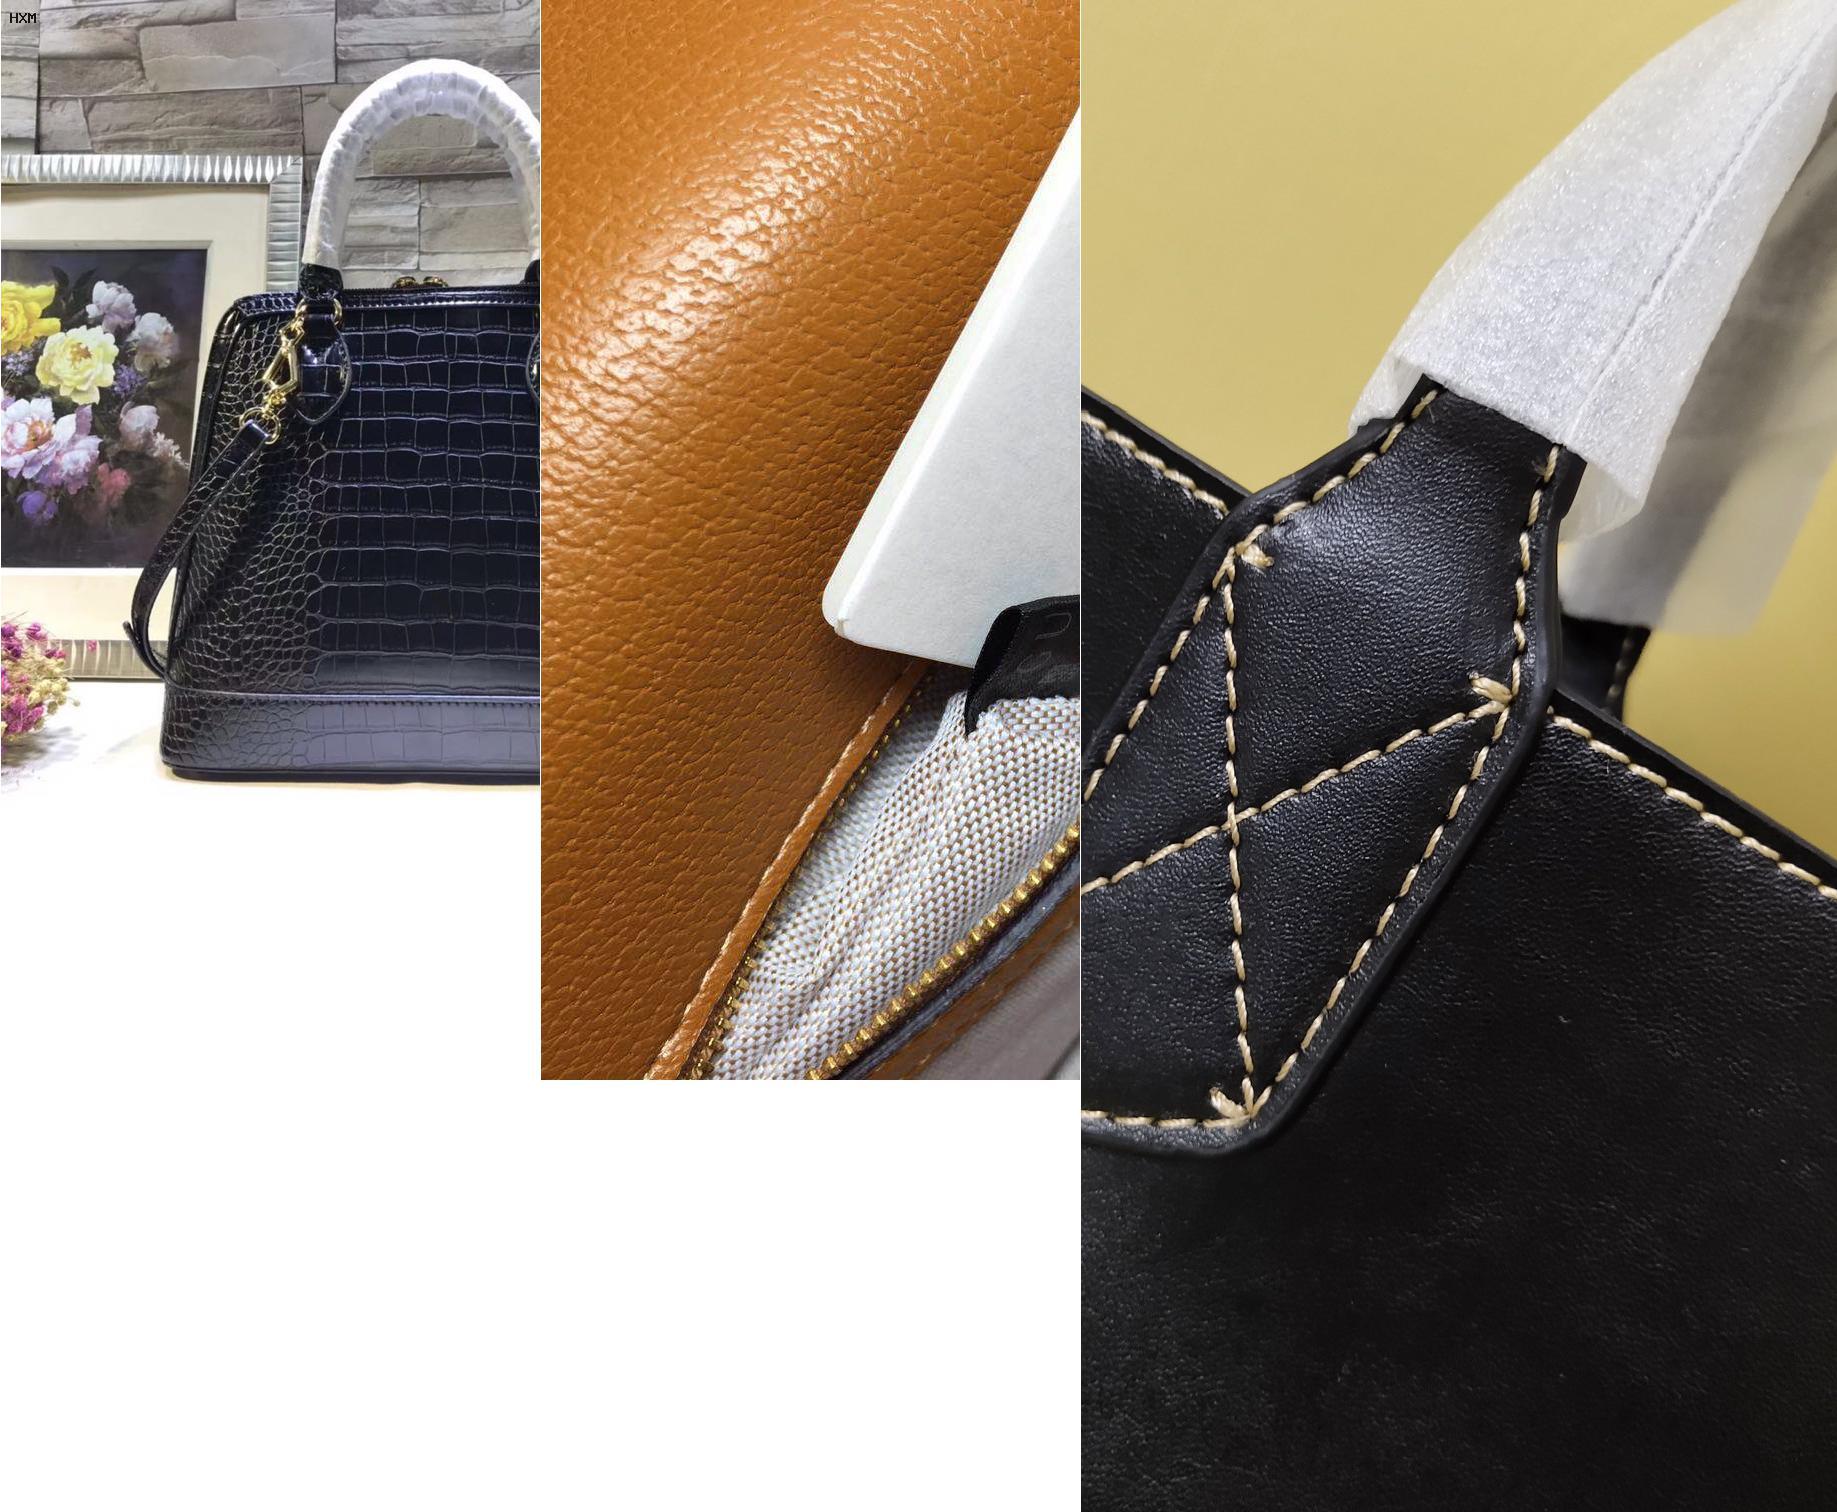 sac ceinture gucci print petite taille